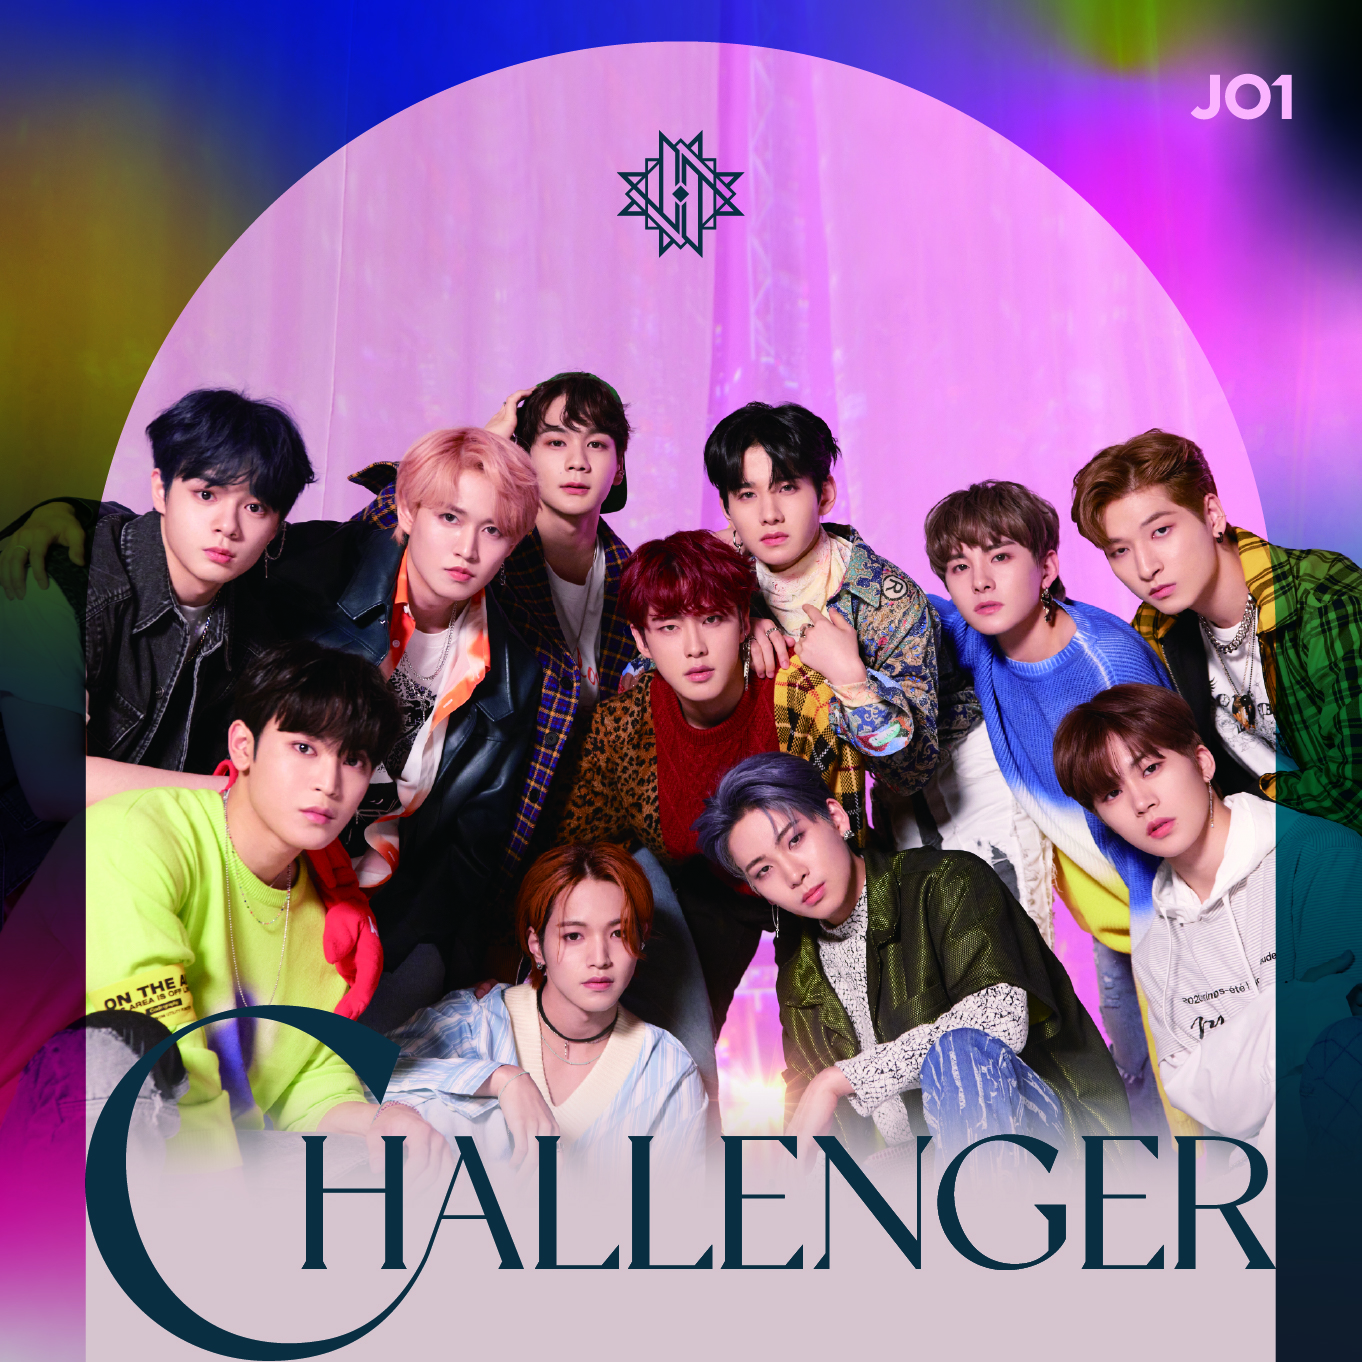 『CHALLENGER』